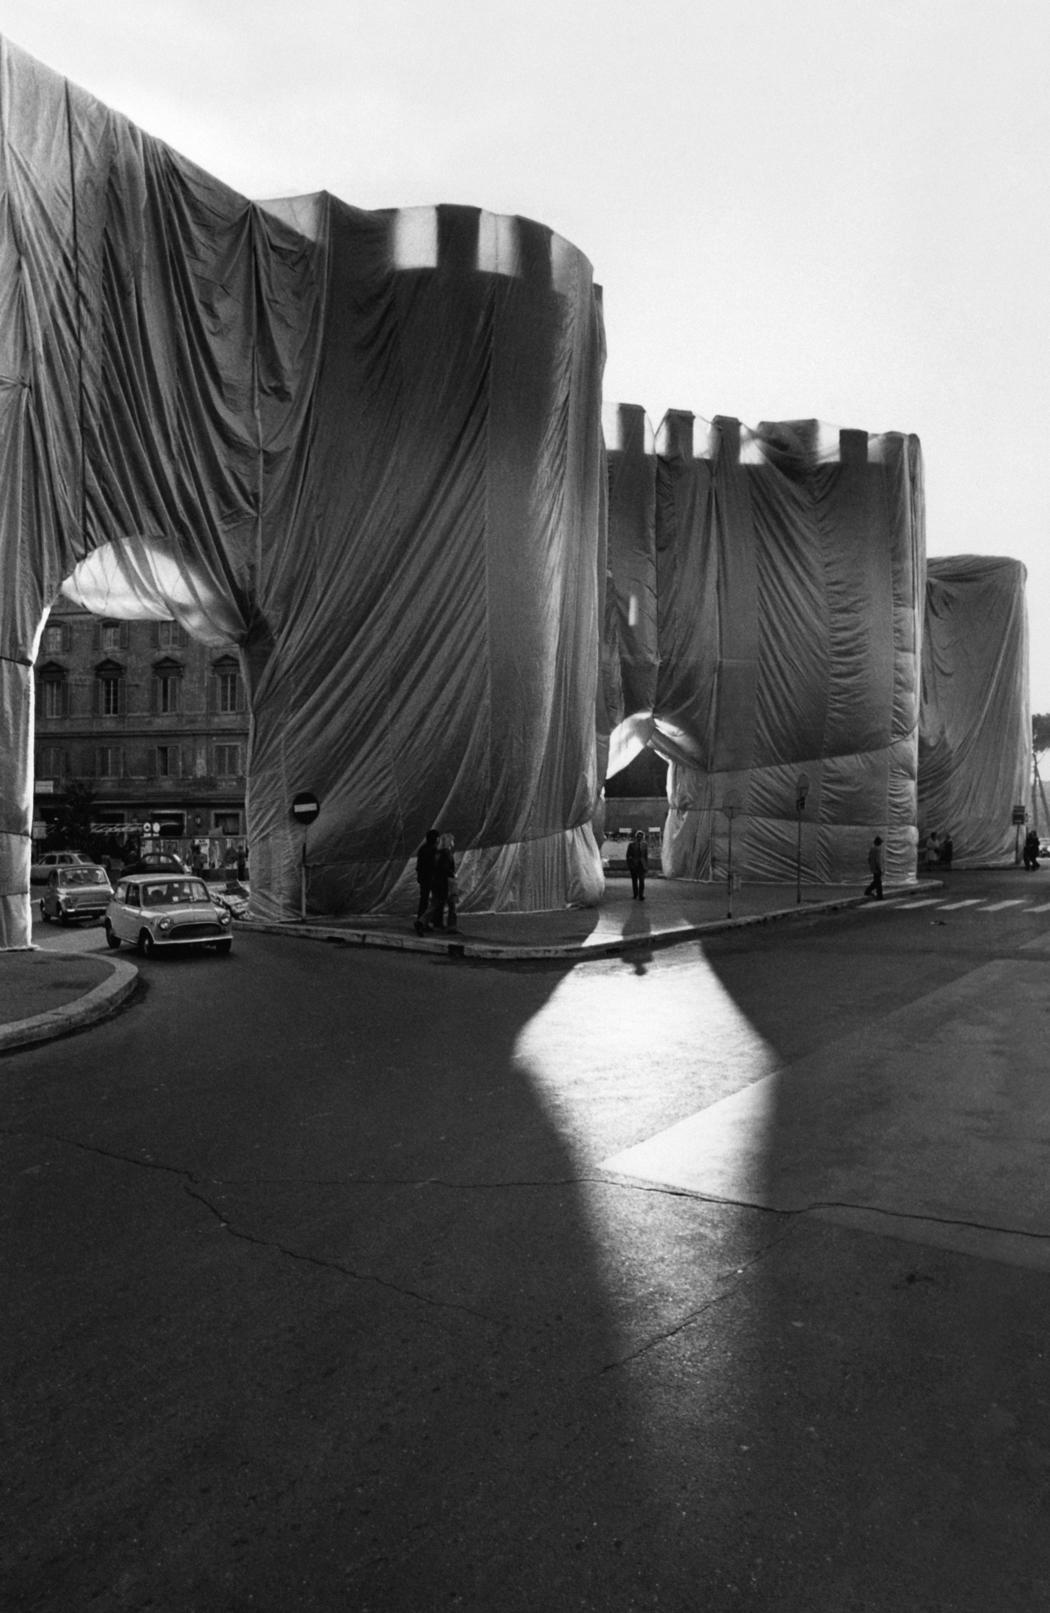 Christo and Jeanne-Claude  The Wall - Wrapped Roman Wall, Via Veneto and Villa Borghese, Rome, Italy, 1973-74  Photo: Vittorio Biffani/Archive Giuseppe Casetti  © 1974 Christo